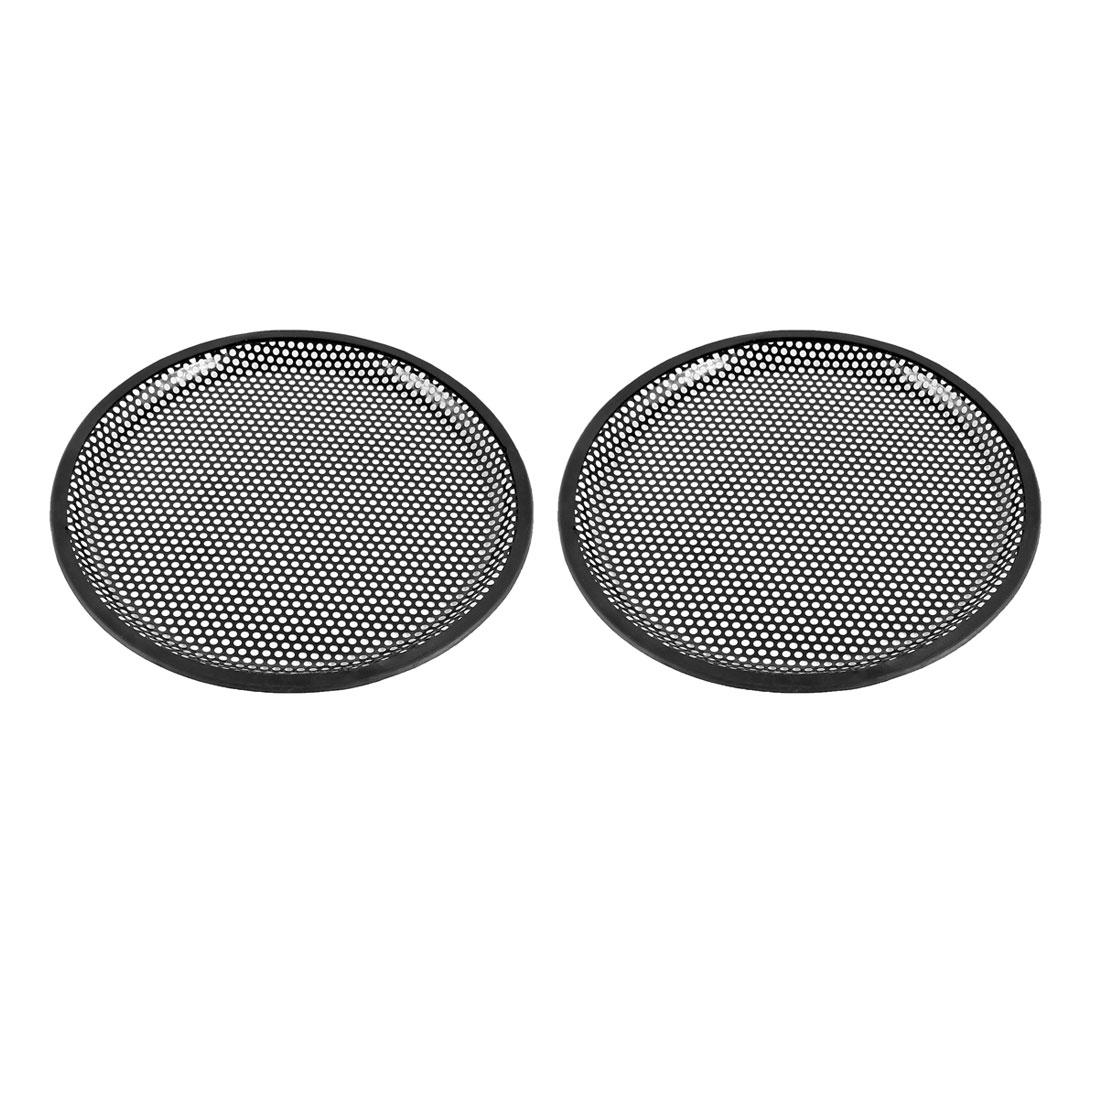 "Unique Bargains 10"" Dia Metal Mesh Round Car Woofer Cover Speaker Grill Black 2 Pcs"